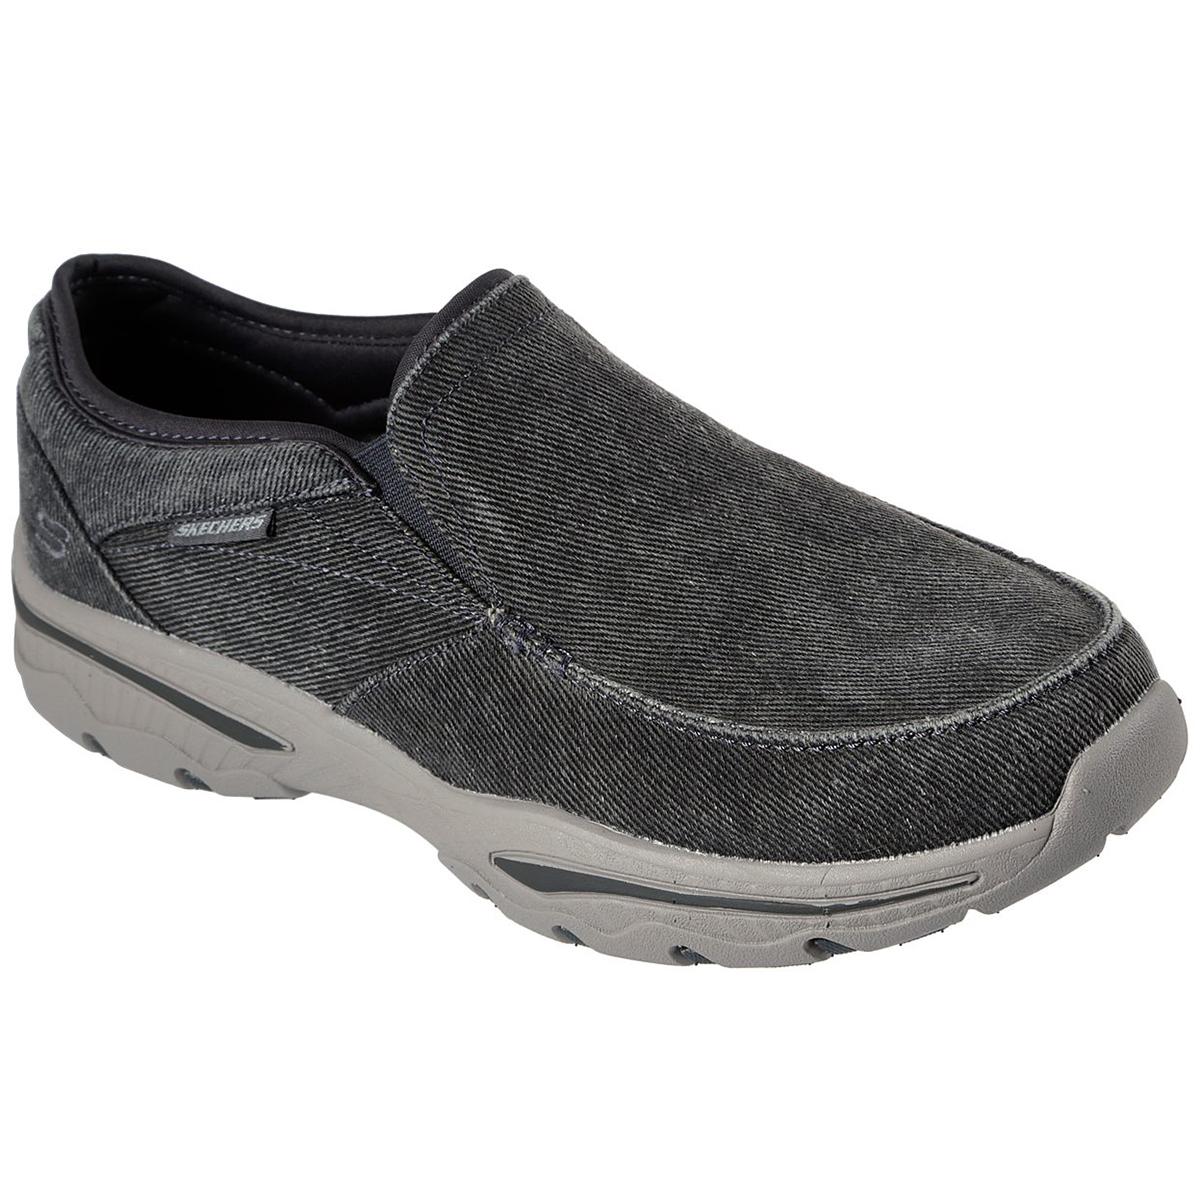 Skechers Men's Relaxed Fit Creston-Moseco Slip-On Shoe - Black, 9.5